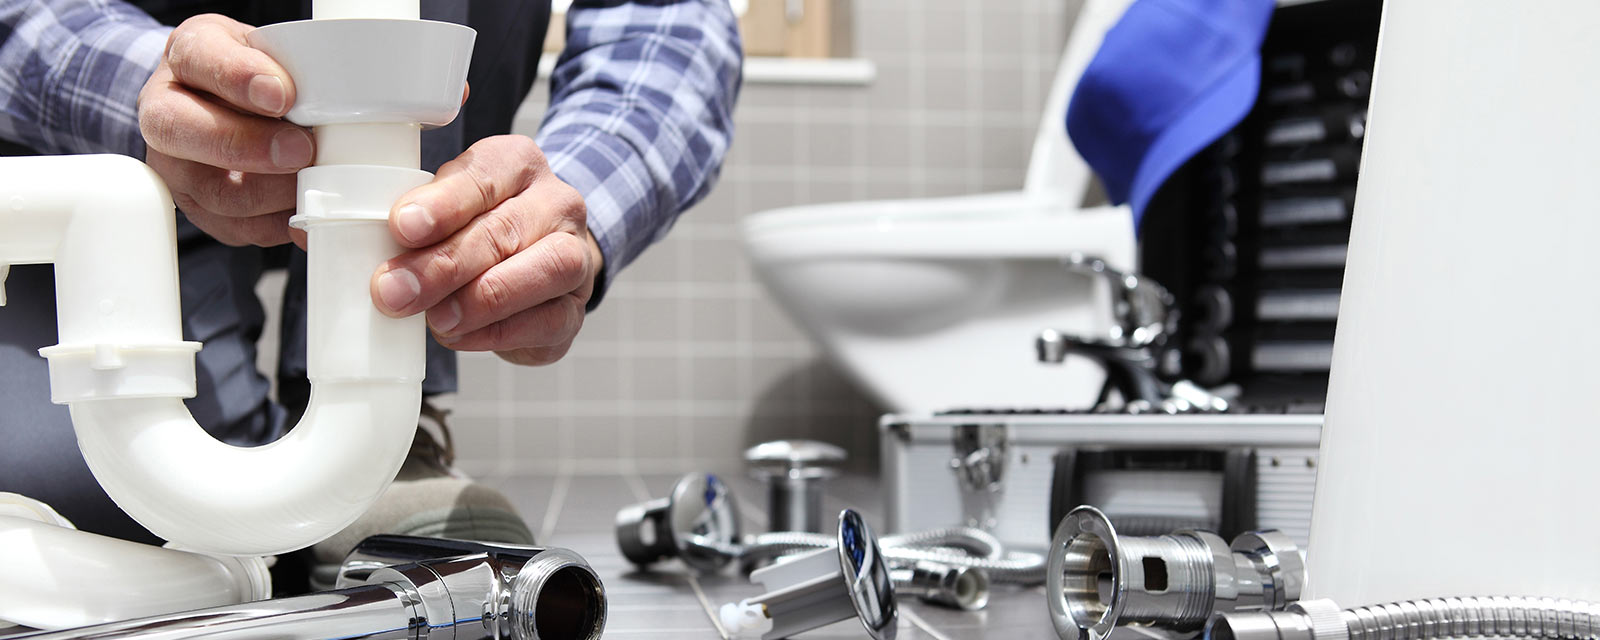 tarif depannage wc